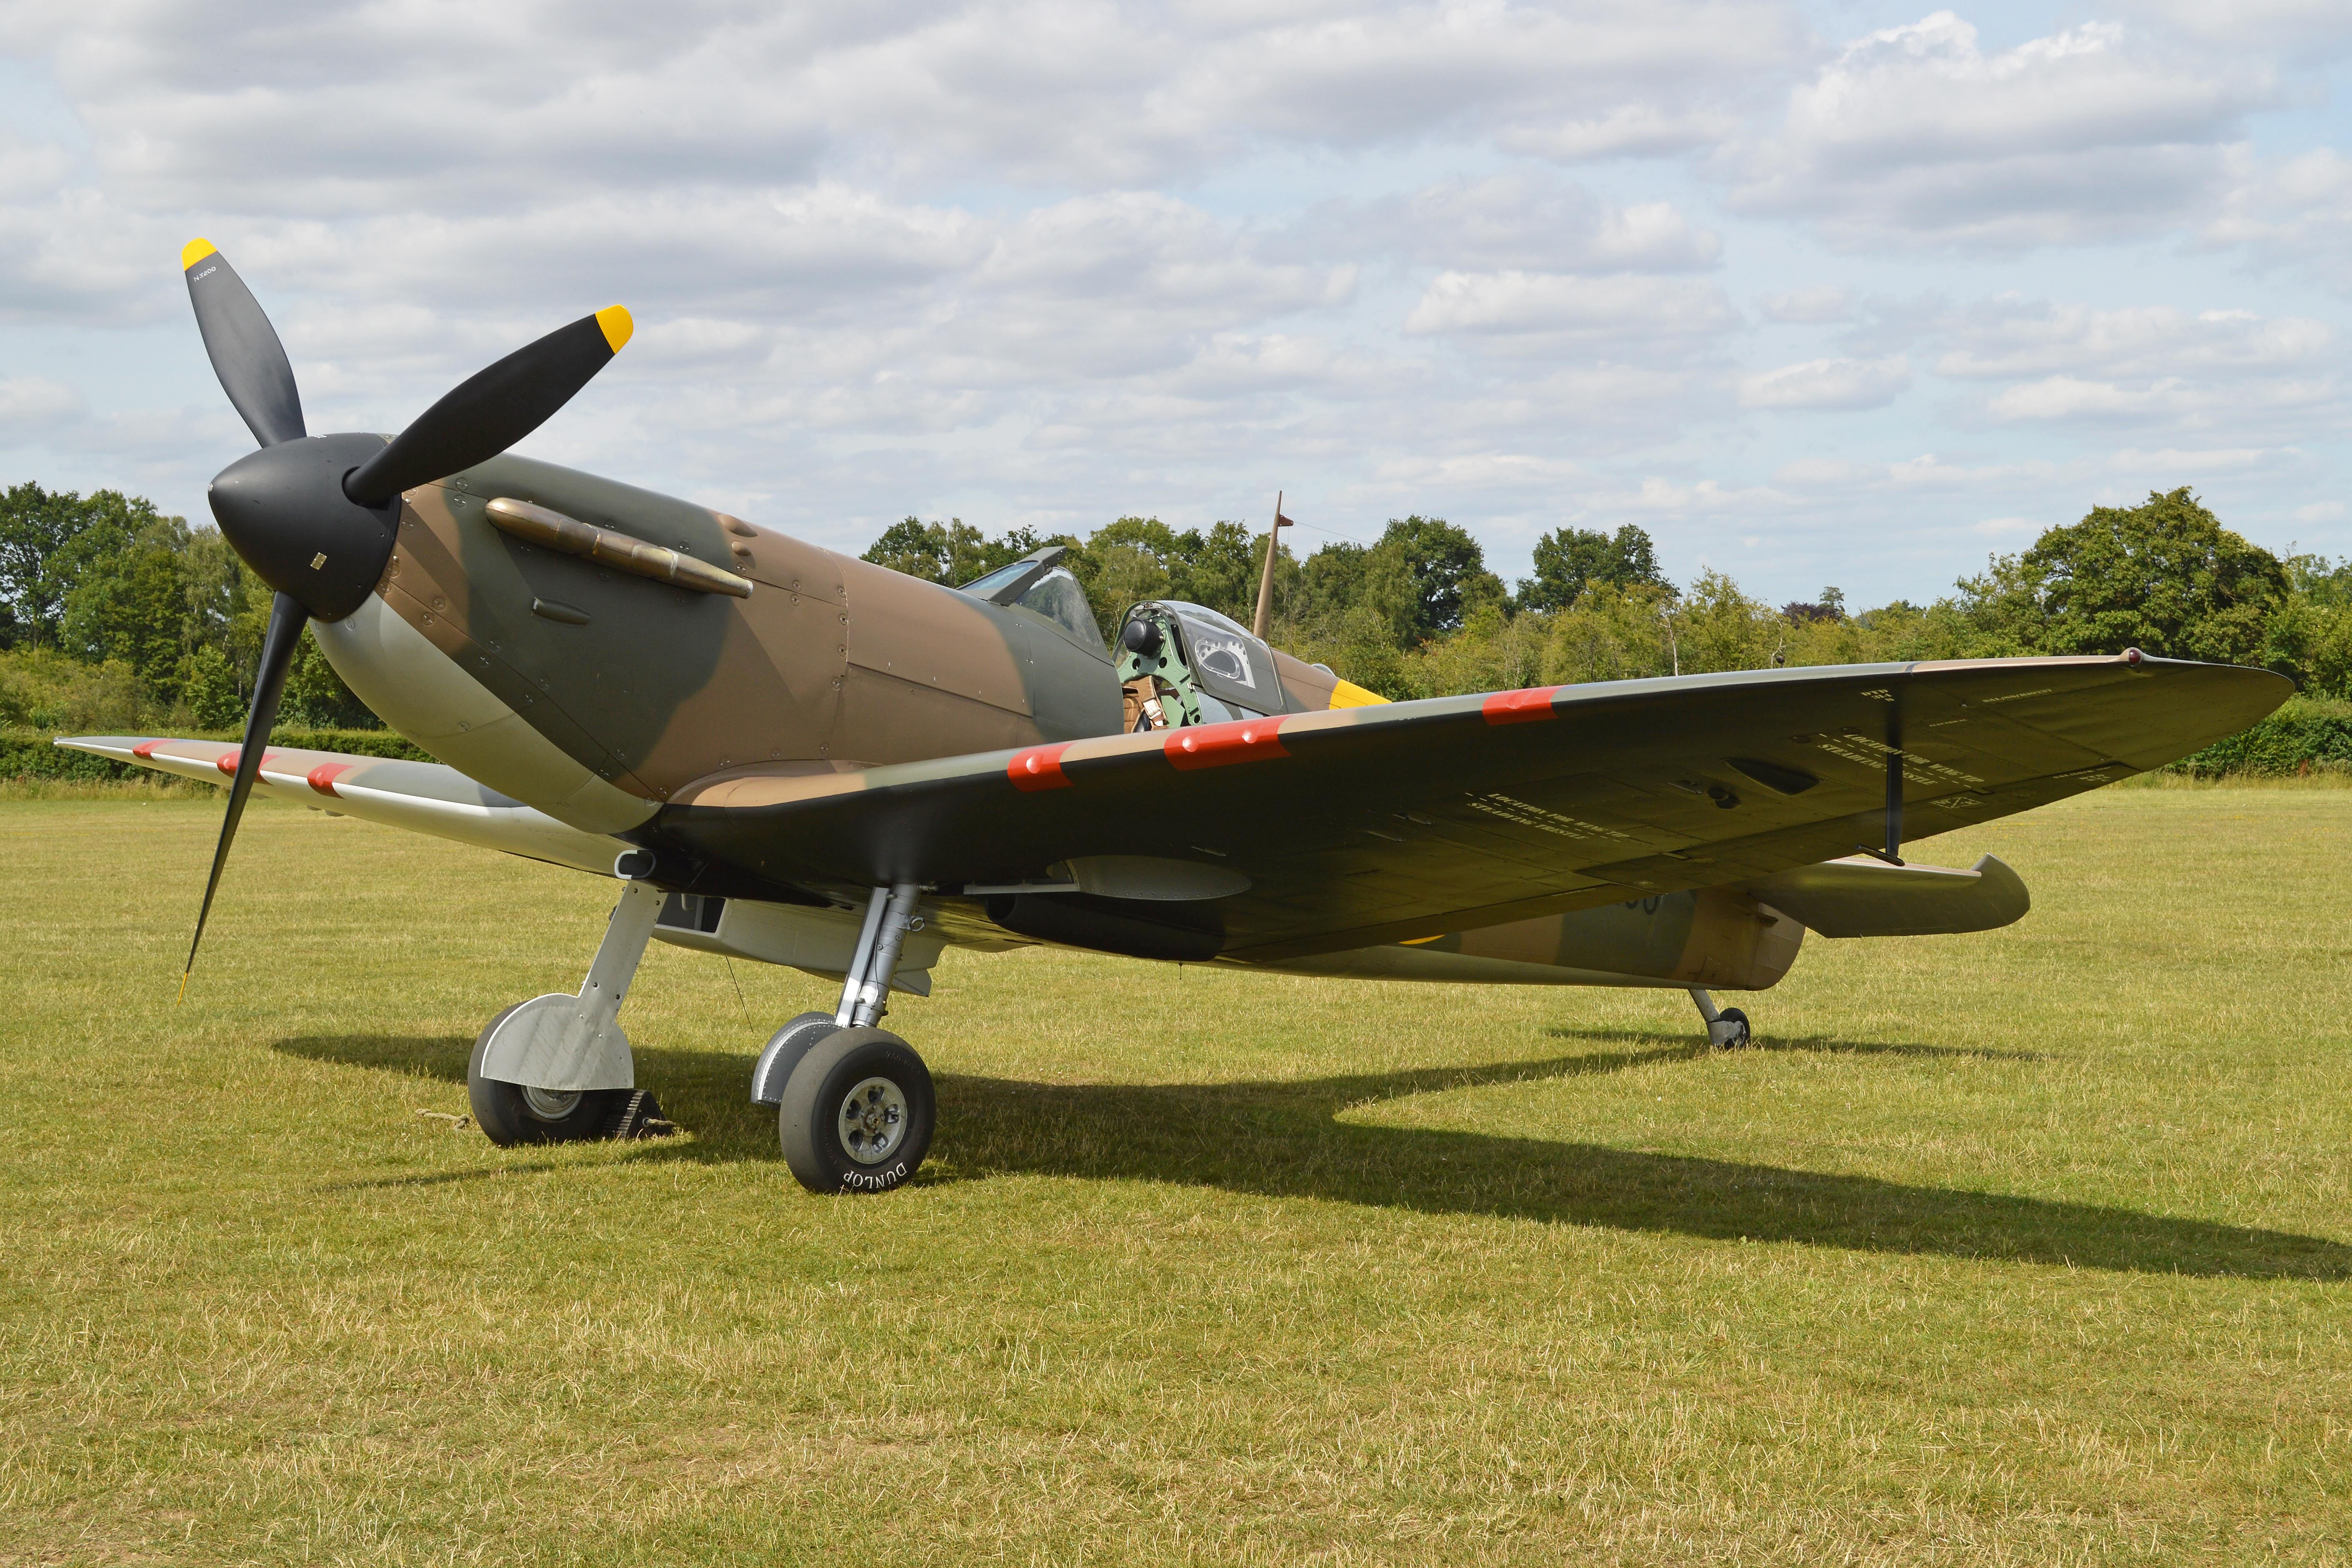 Supermarine Spitfire Ia N3200 (G-CFGJ)